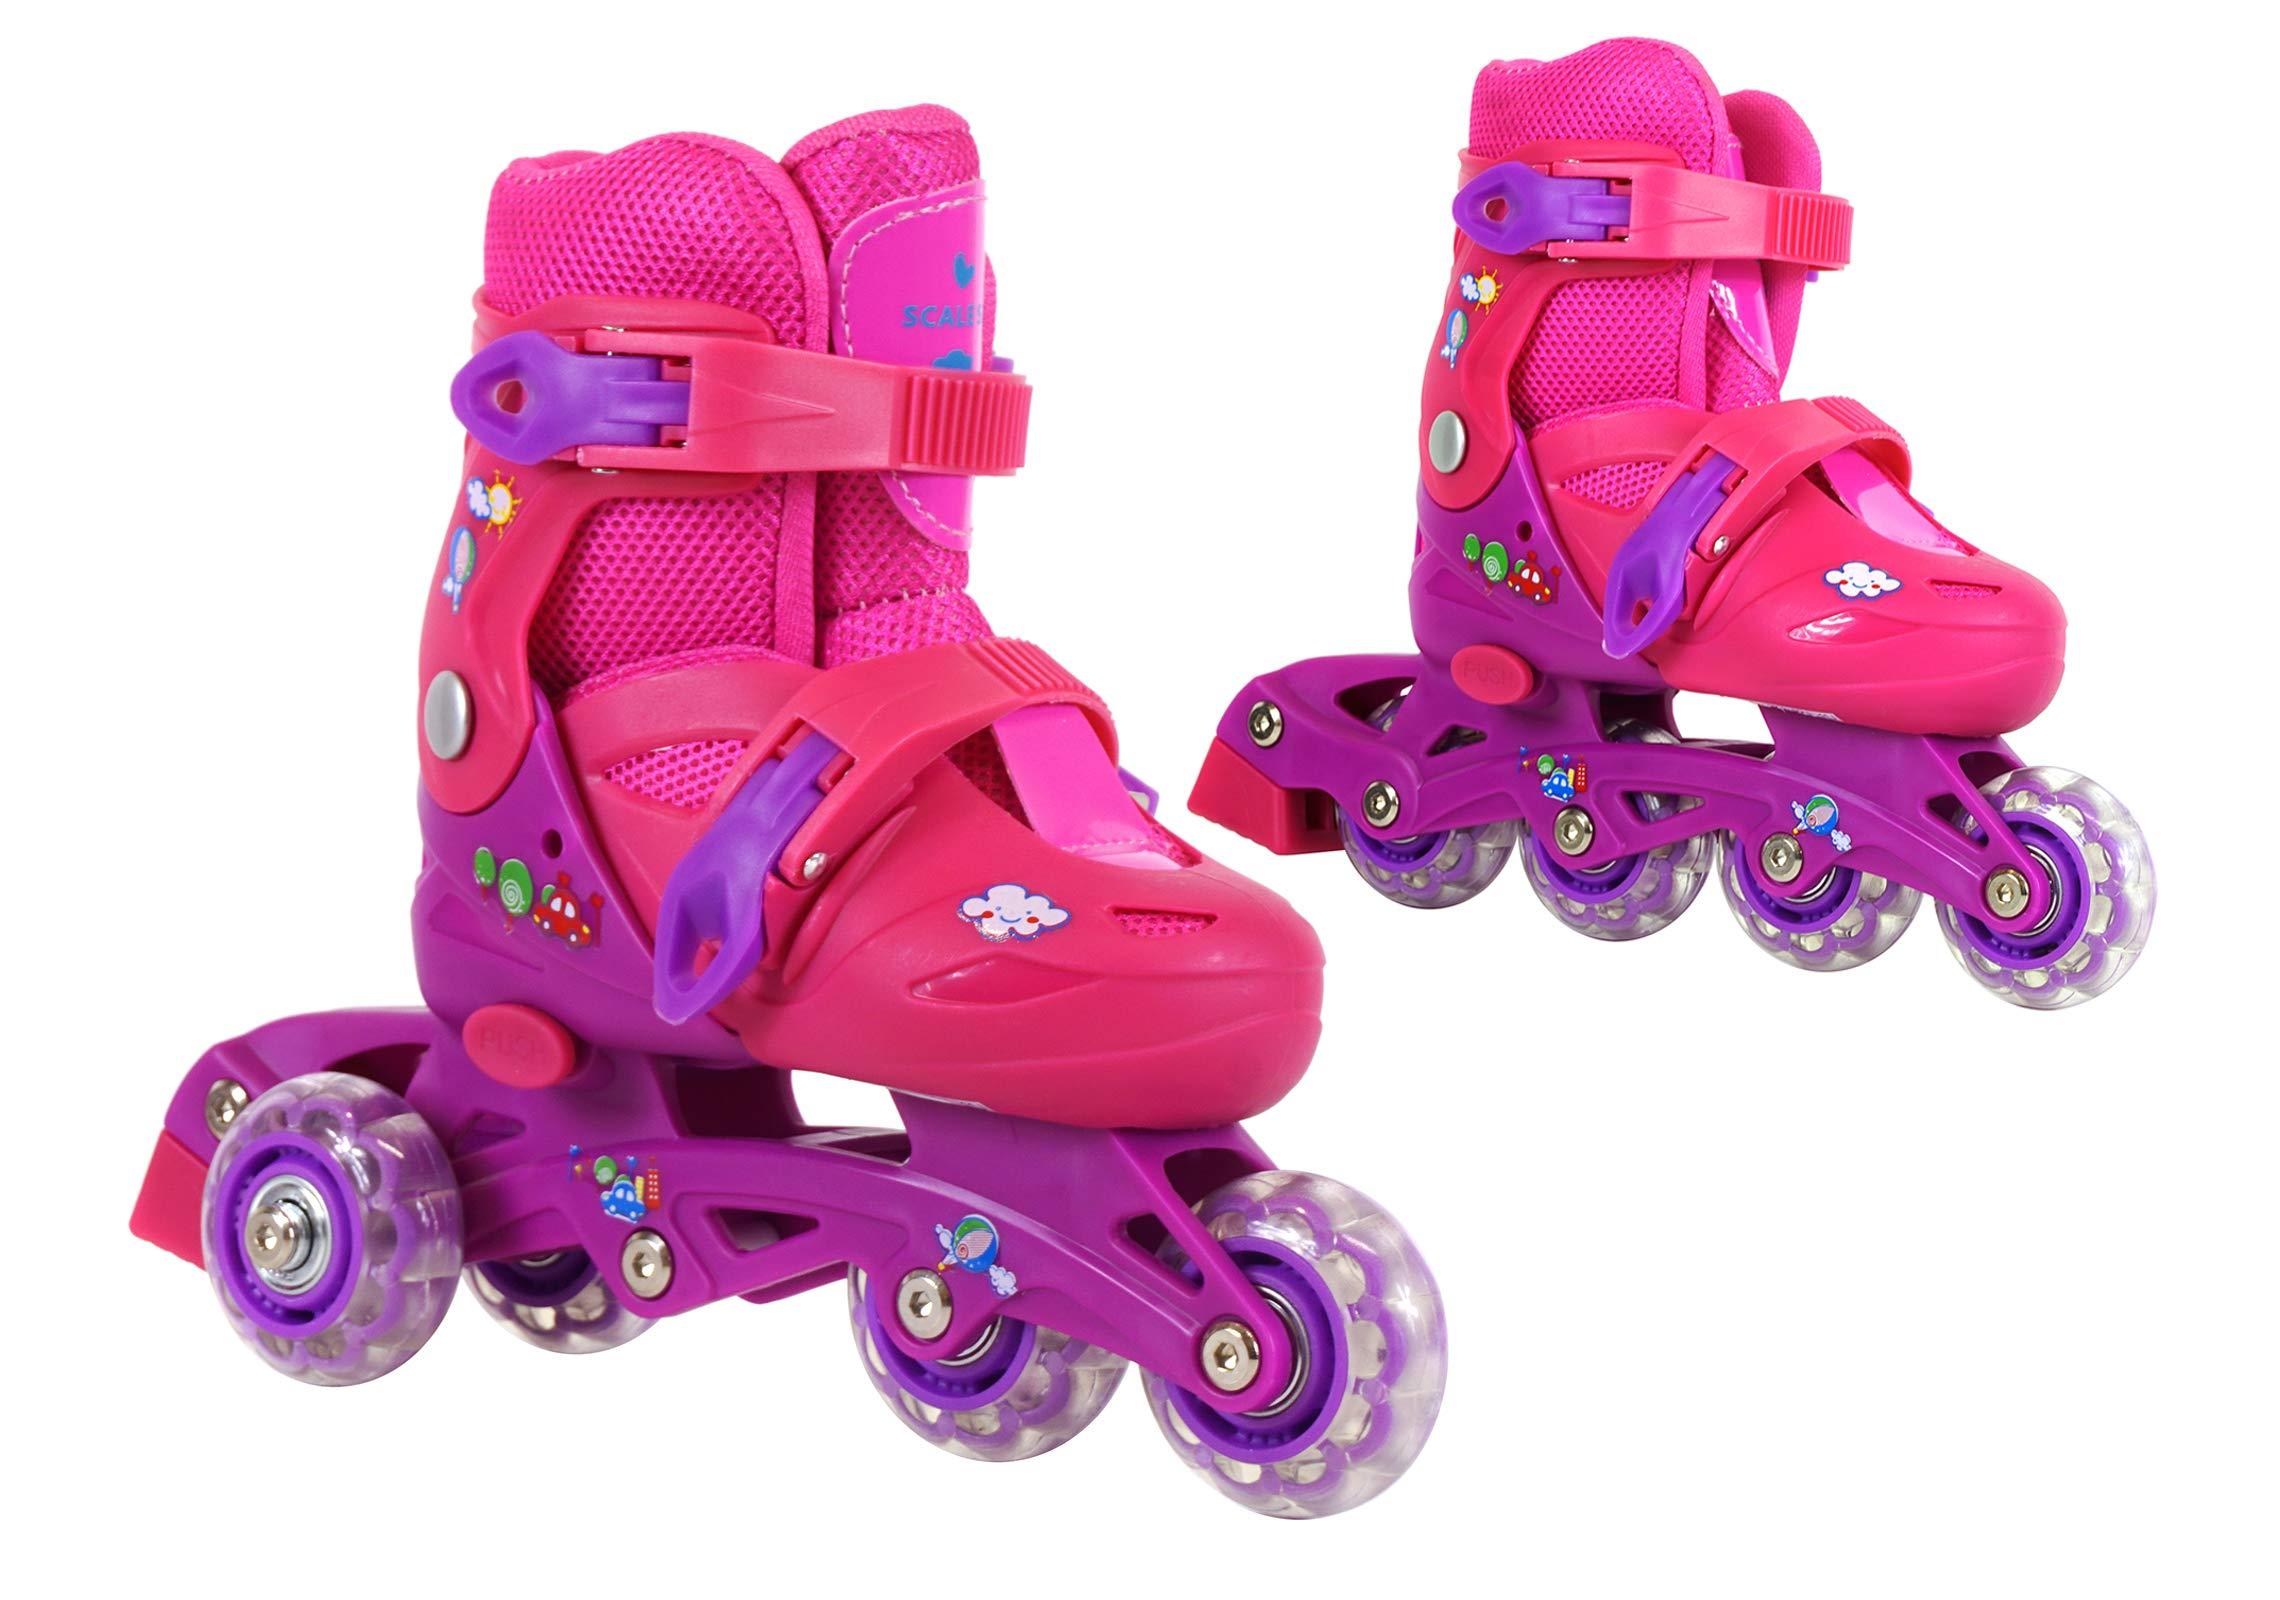 Kids Training Adjustable Skates Combo 3 Wheels 2 in 1 for Preschool Junior Boys and Girls Perfect First Inline Skates Child Roller Skates